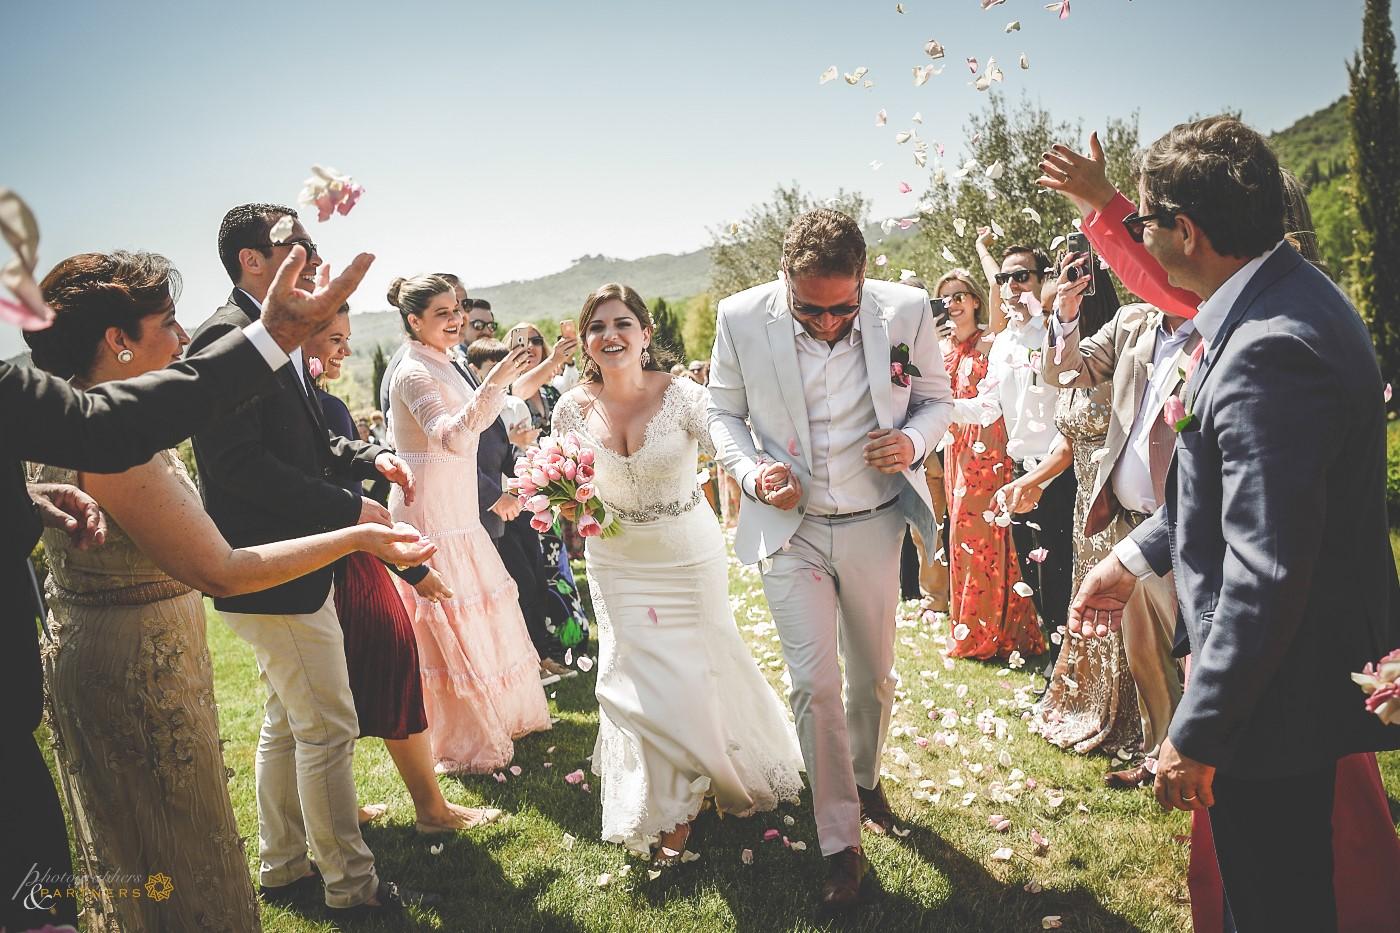 umbria_wedding_photos_12.jpg